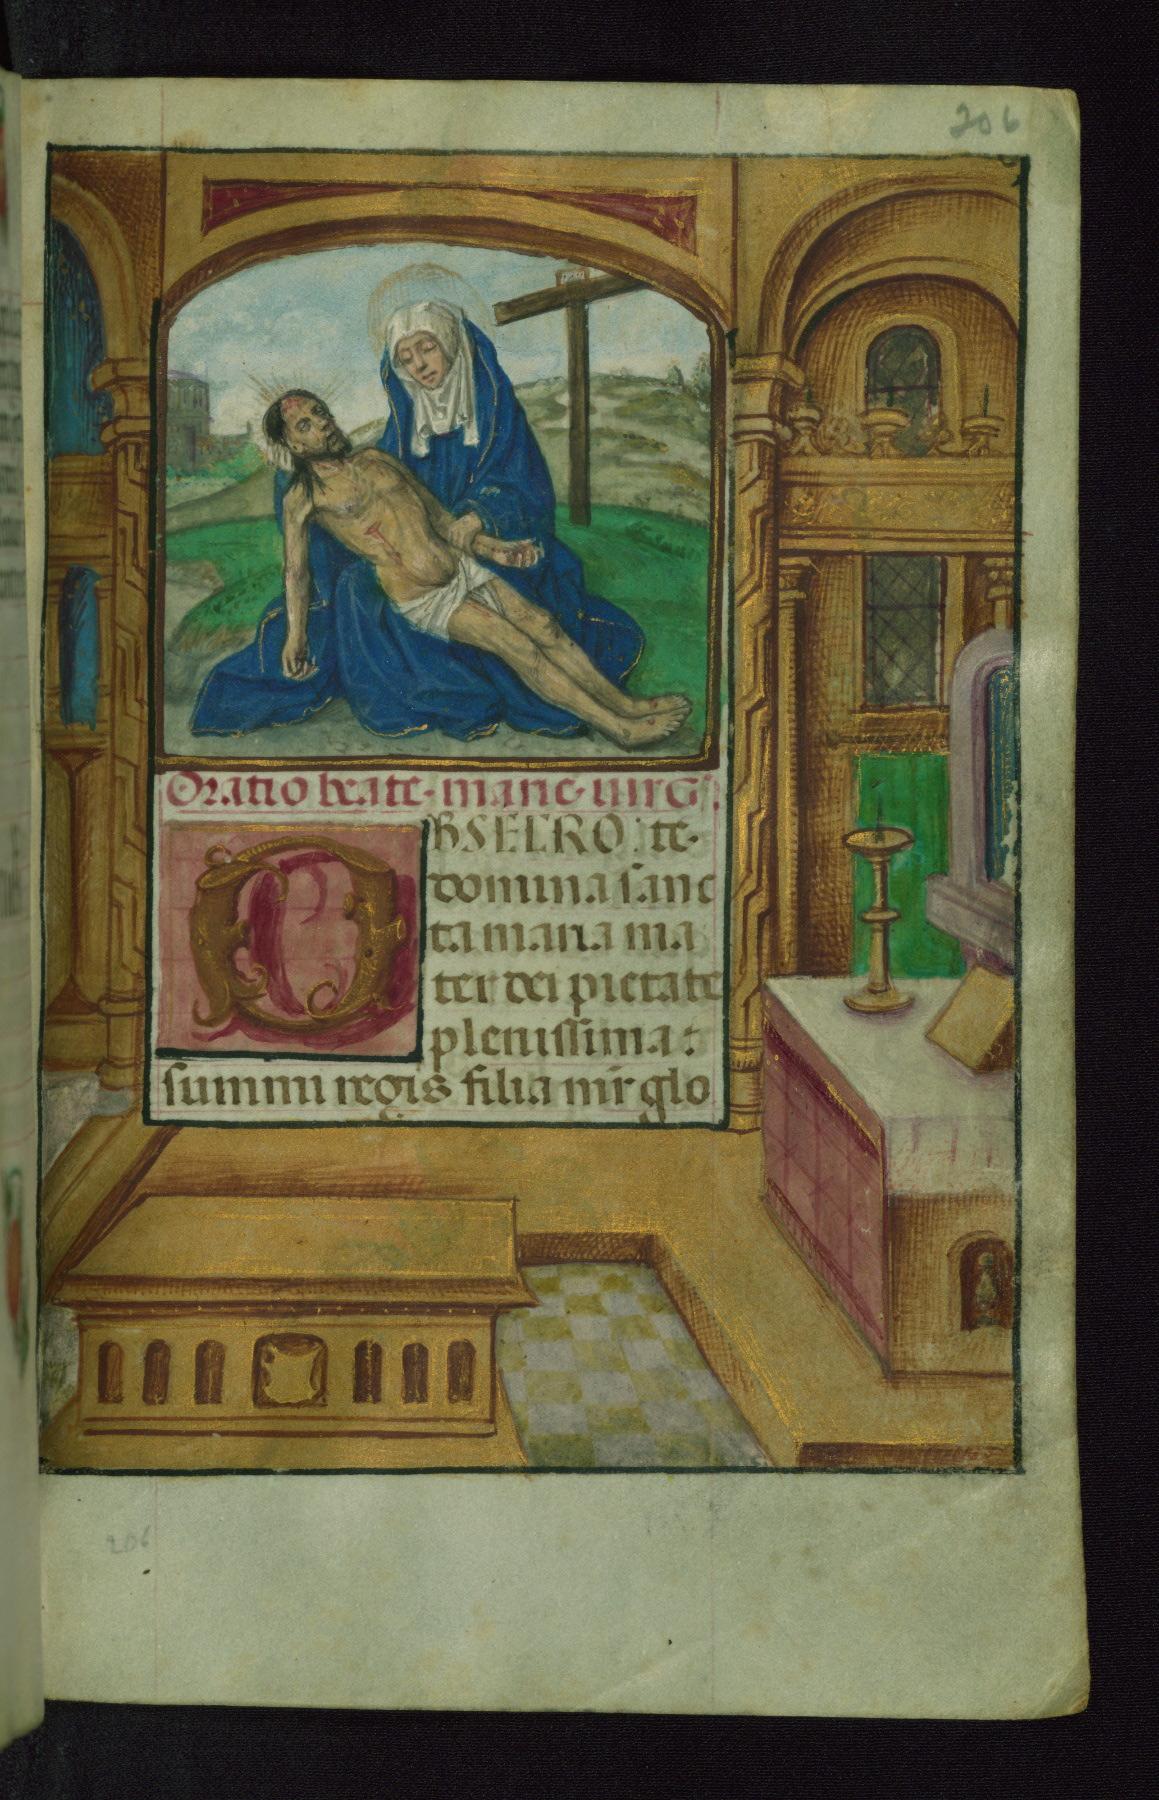 Book of Hours 1500 ca Ms. W.427 Walters Art Museum Baltimore fol. 206r Pieta